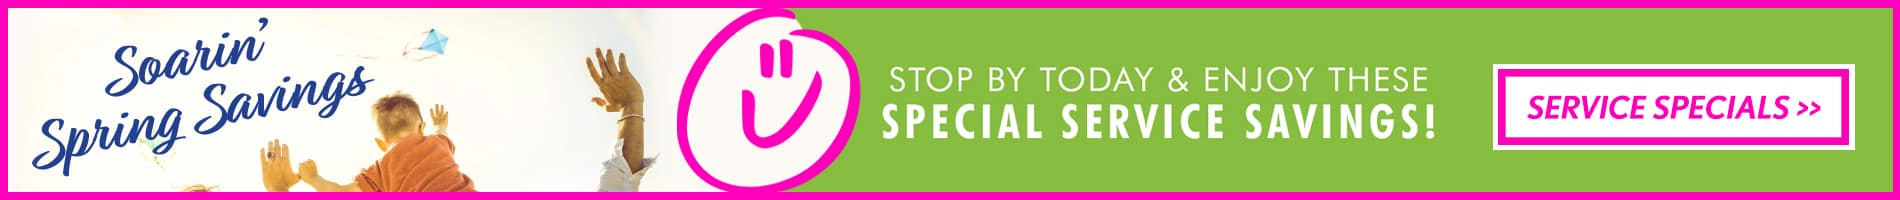 Spring Service Specials_Desk_CTA